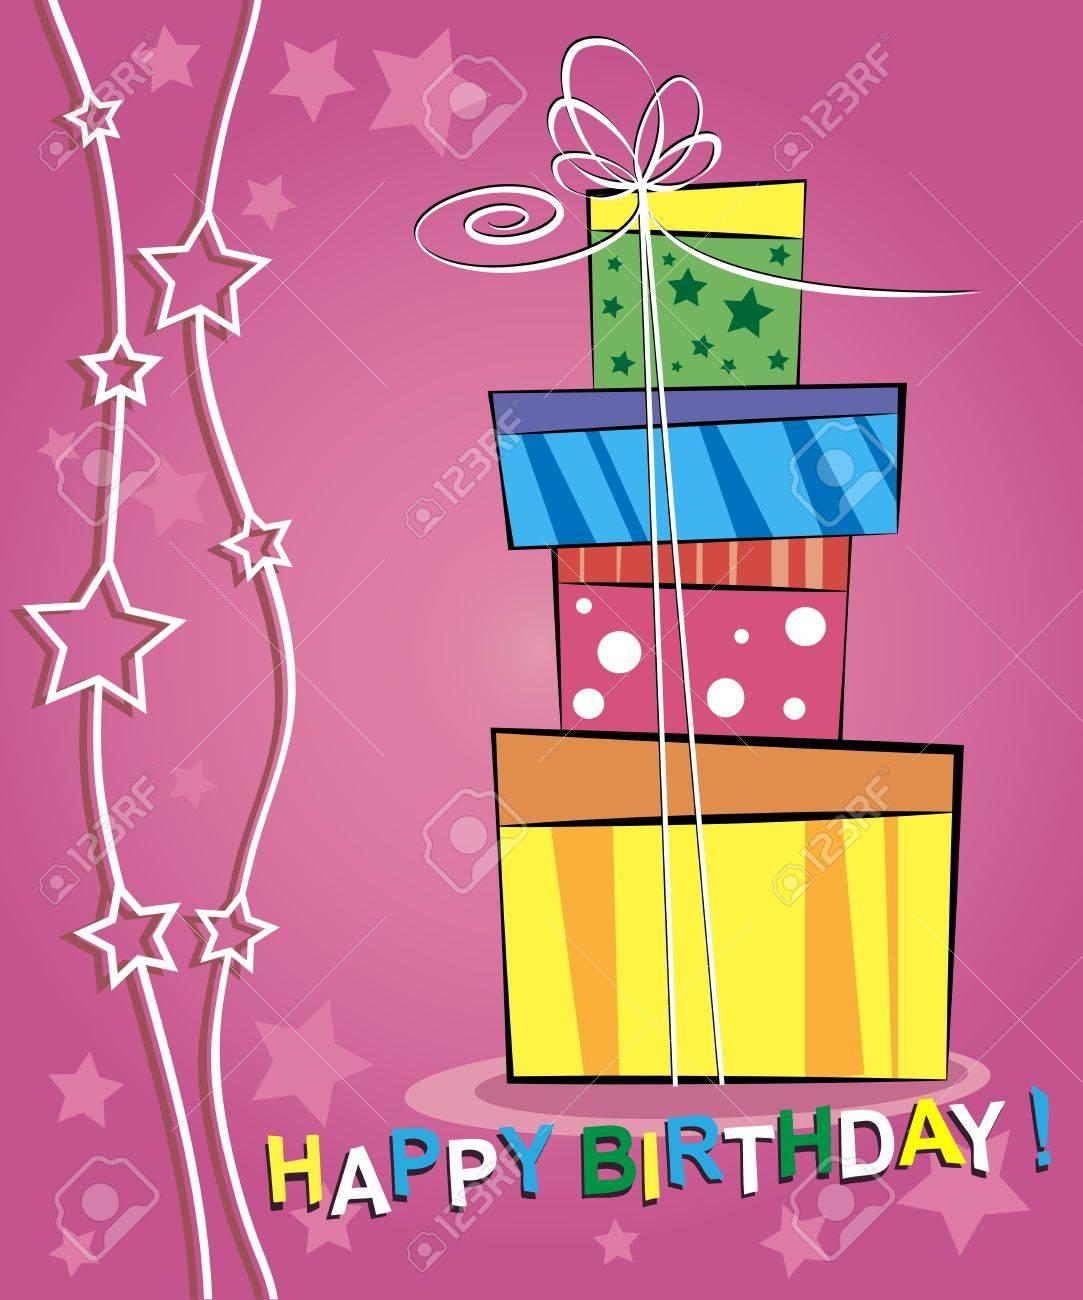 Vector illustration of happy birthday card design Stock Vector - 16062130